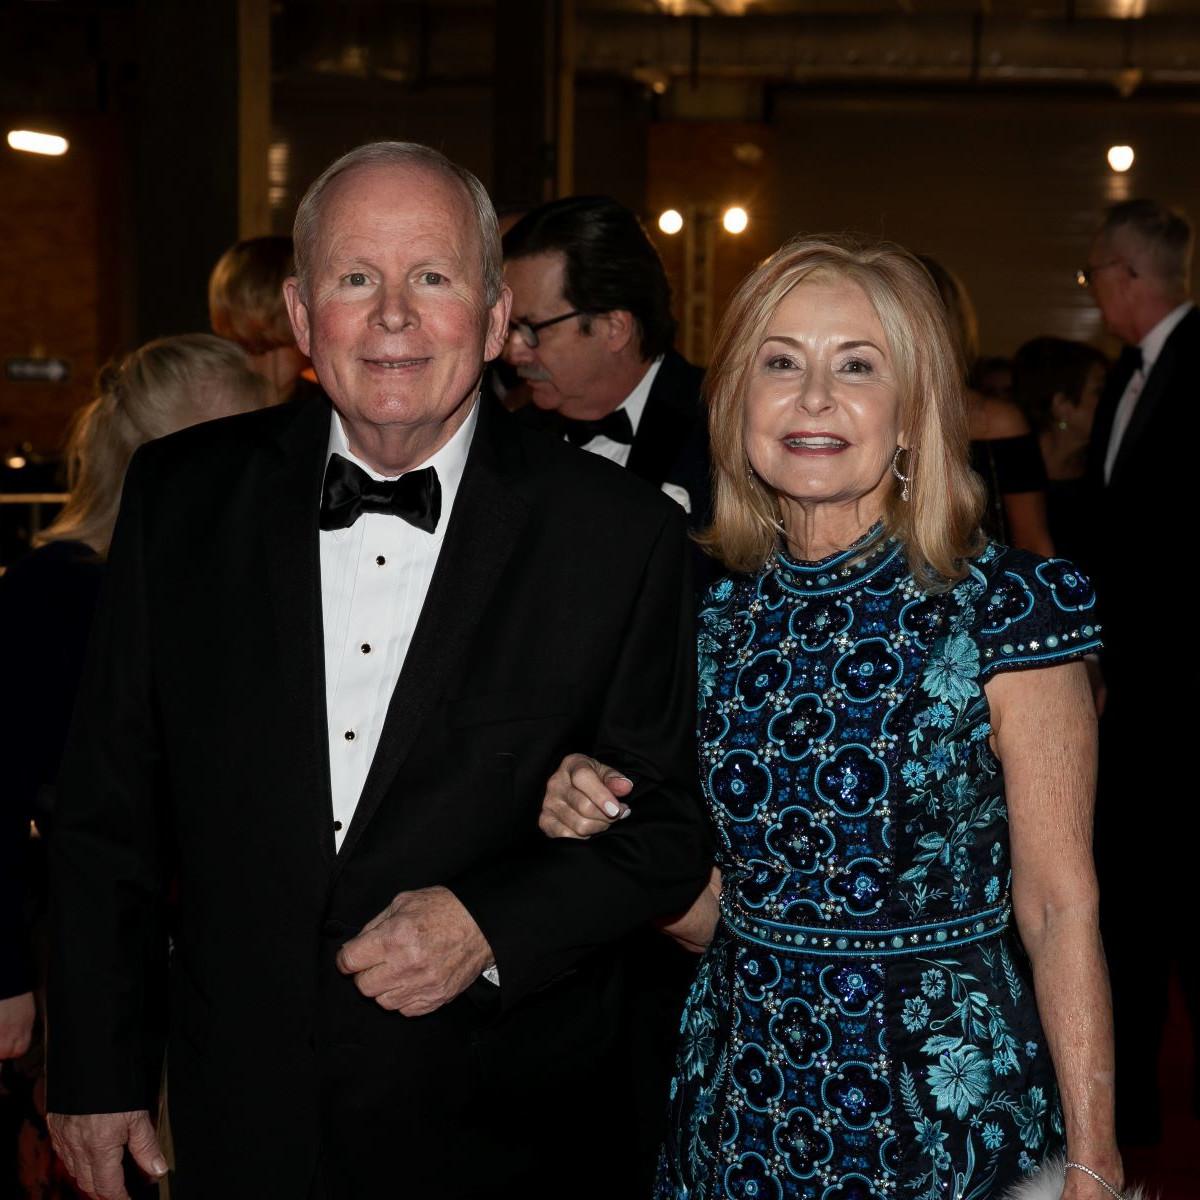 Kathy Sneed, Dr. Robert Hames